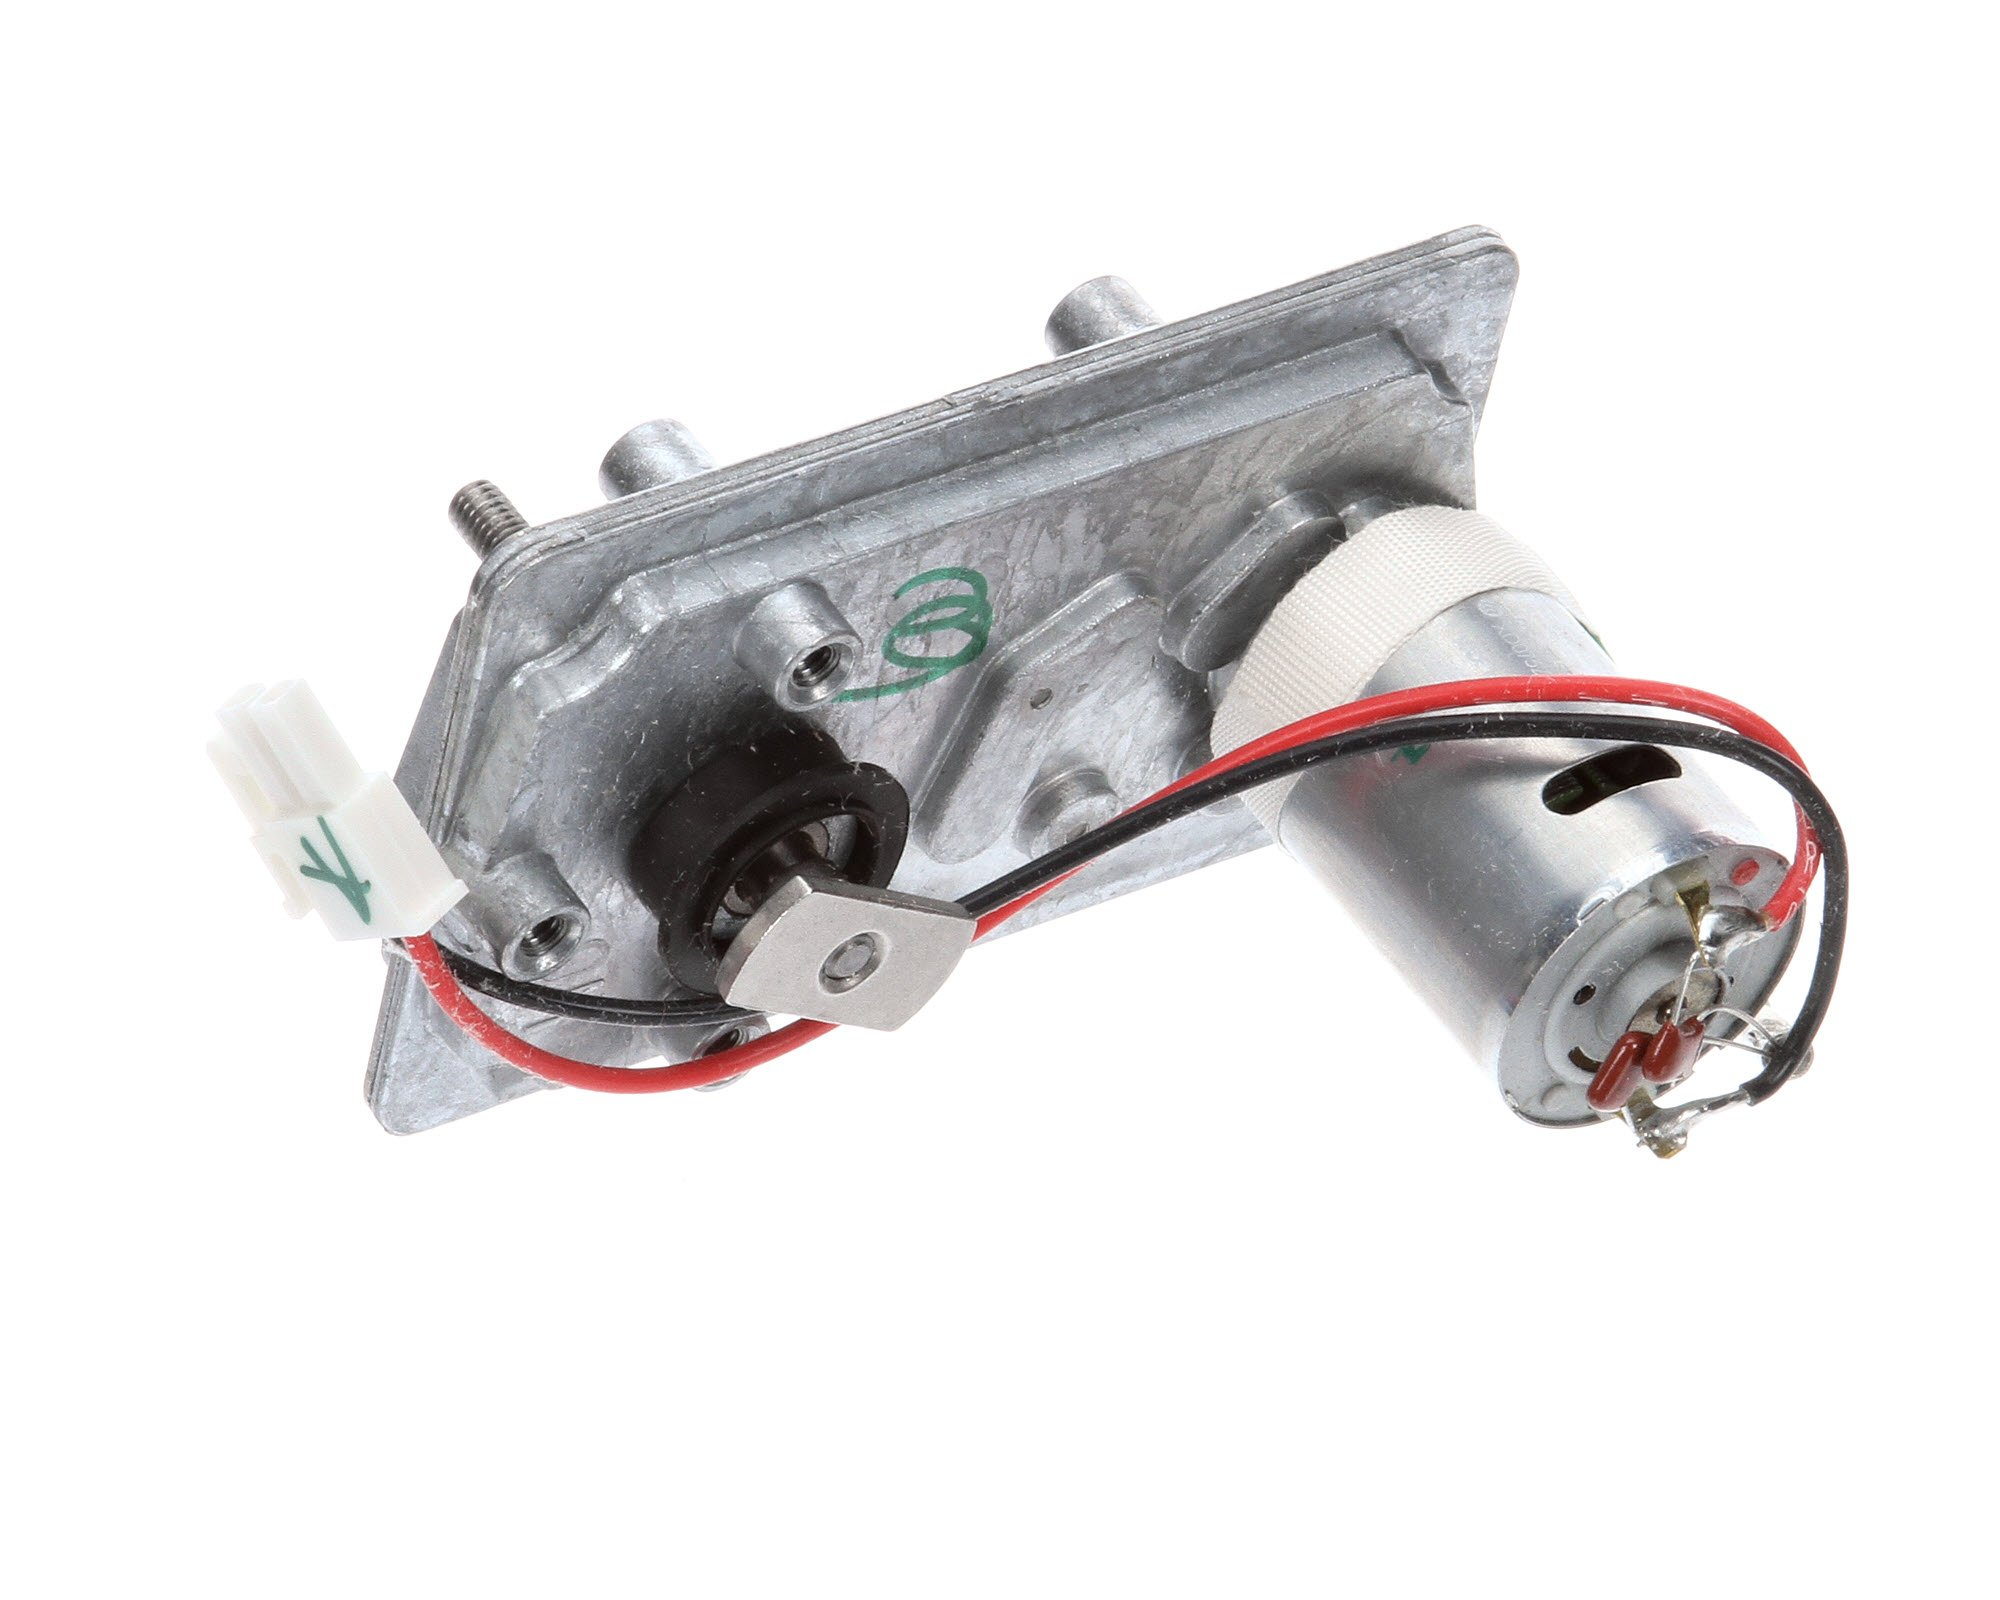 Bunn 37037.0001 2-24DVDC Var Gearmotor Assembly